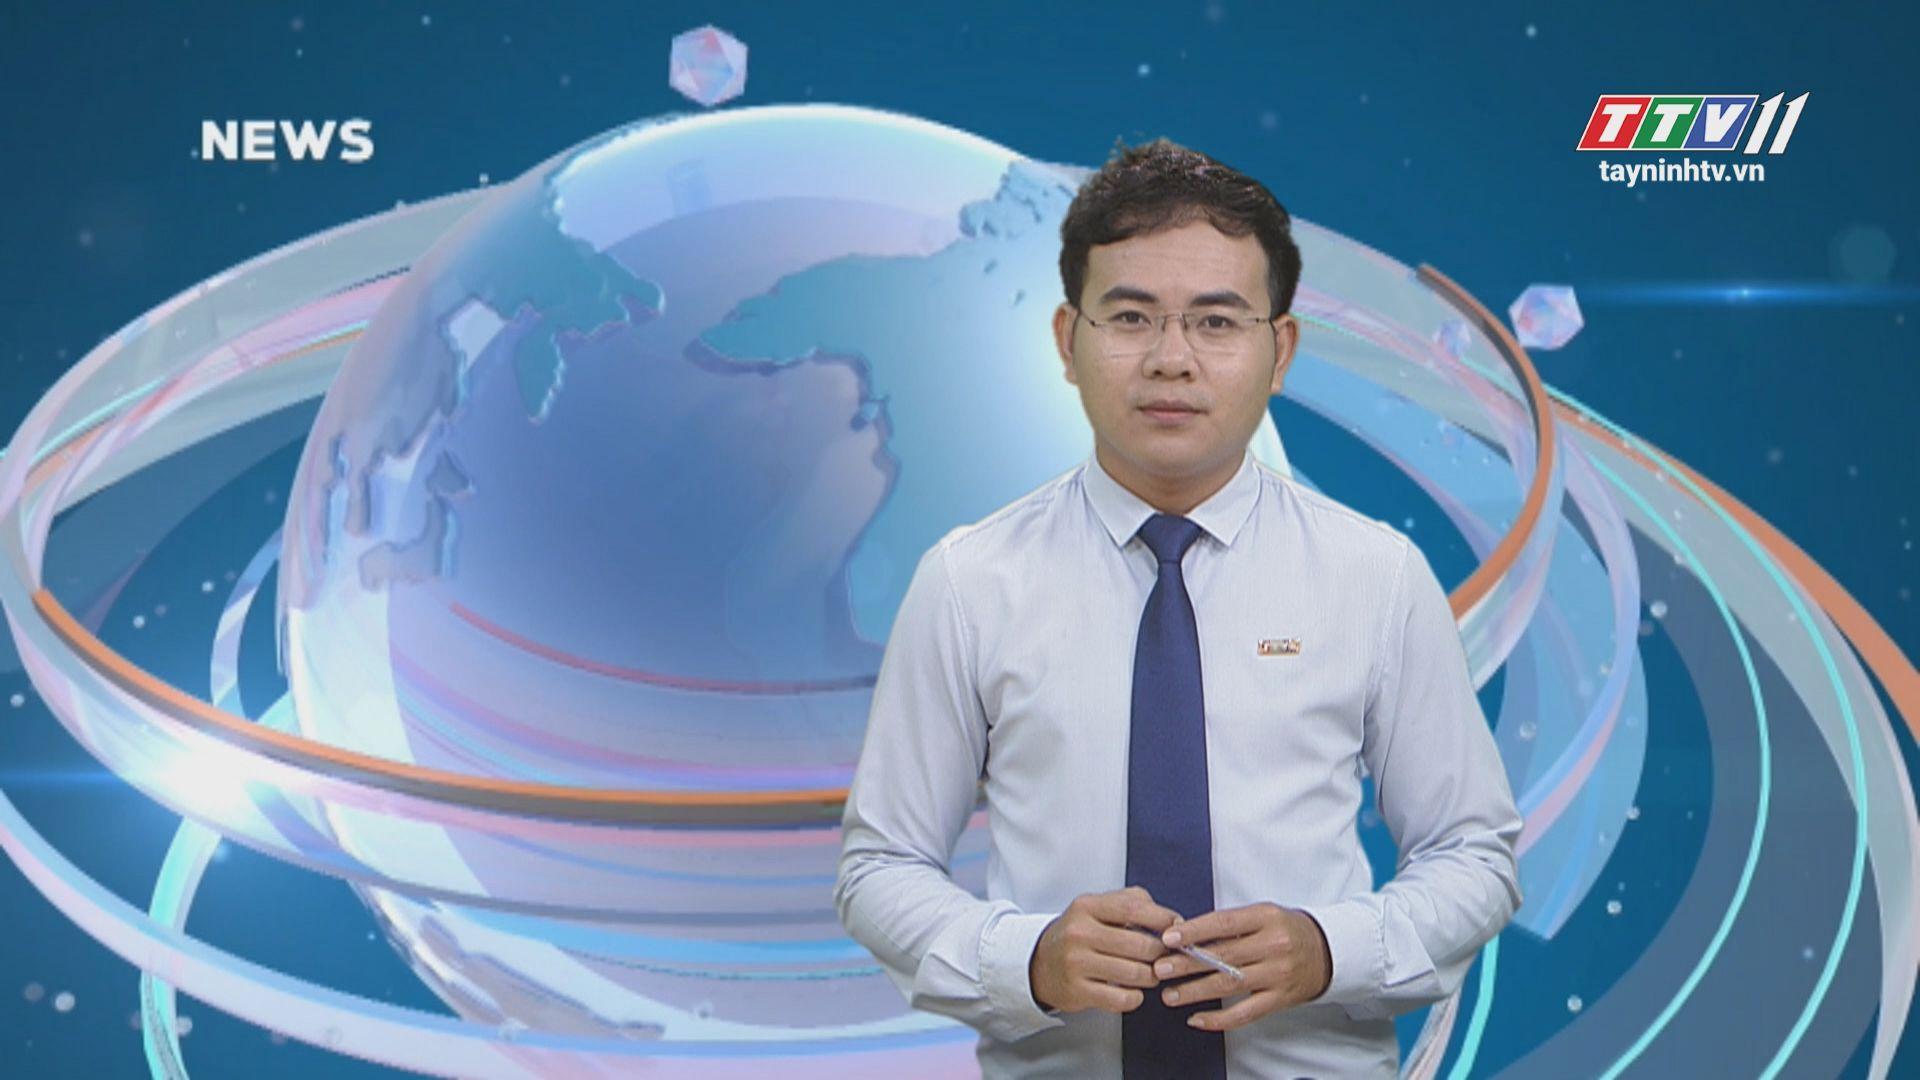 TTVNews 10-11-2019 | Today news | Tây Ninh TV